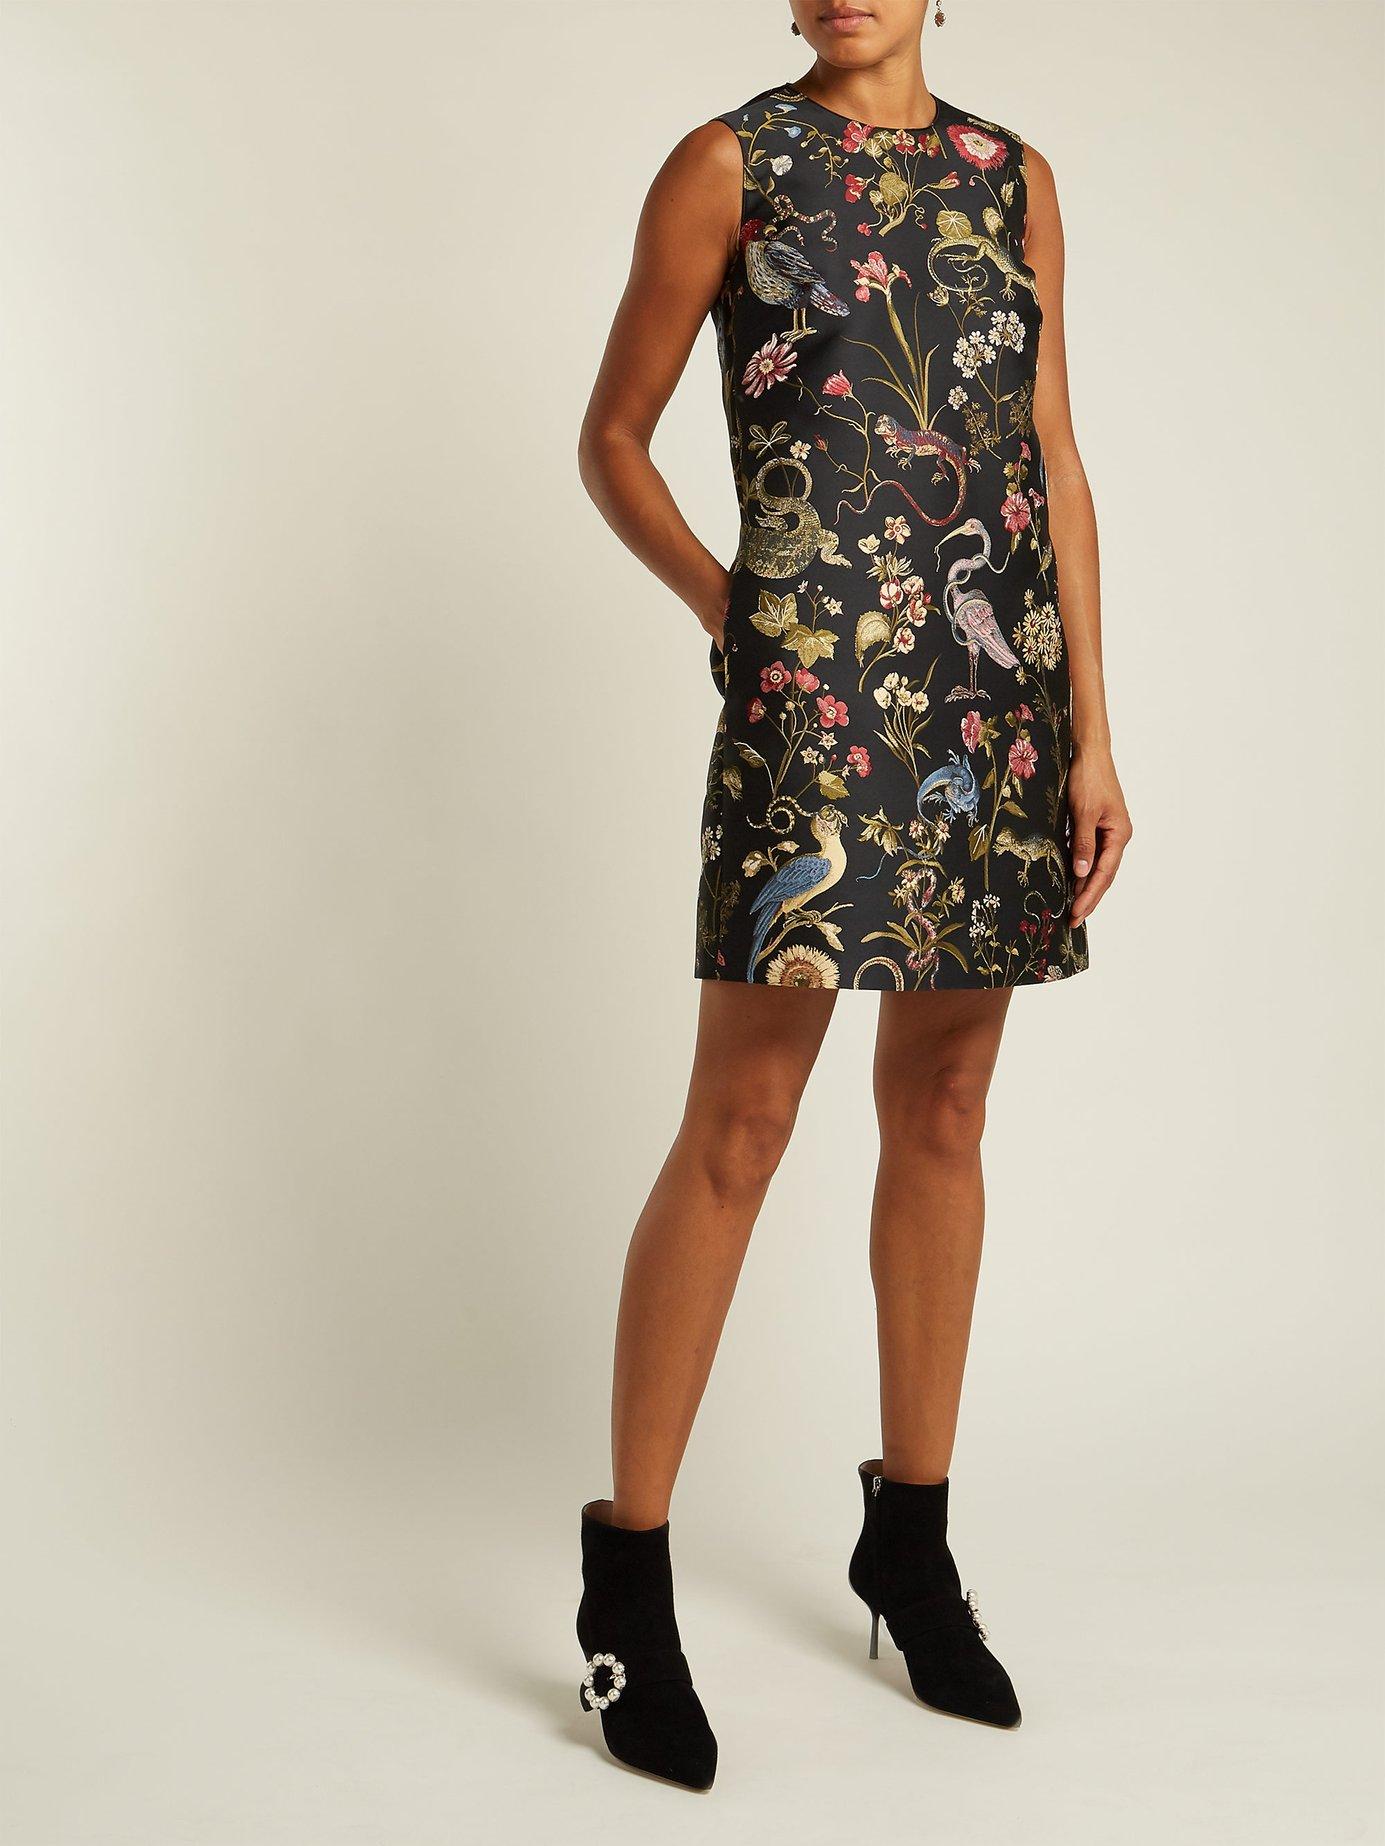 Floral-jacquard shift dress by Redvalentino